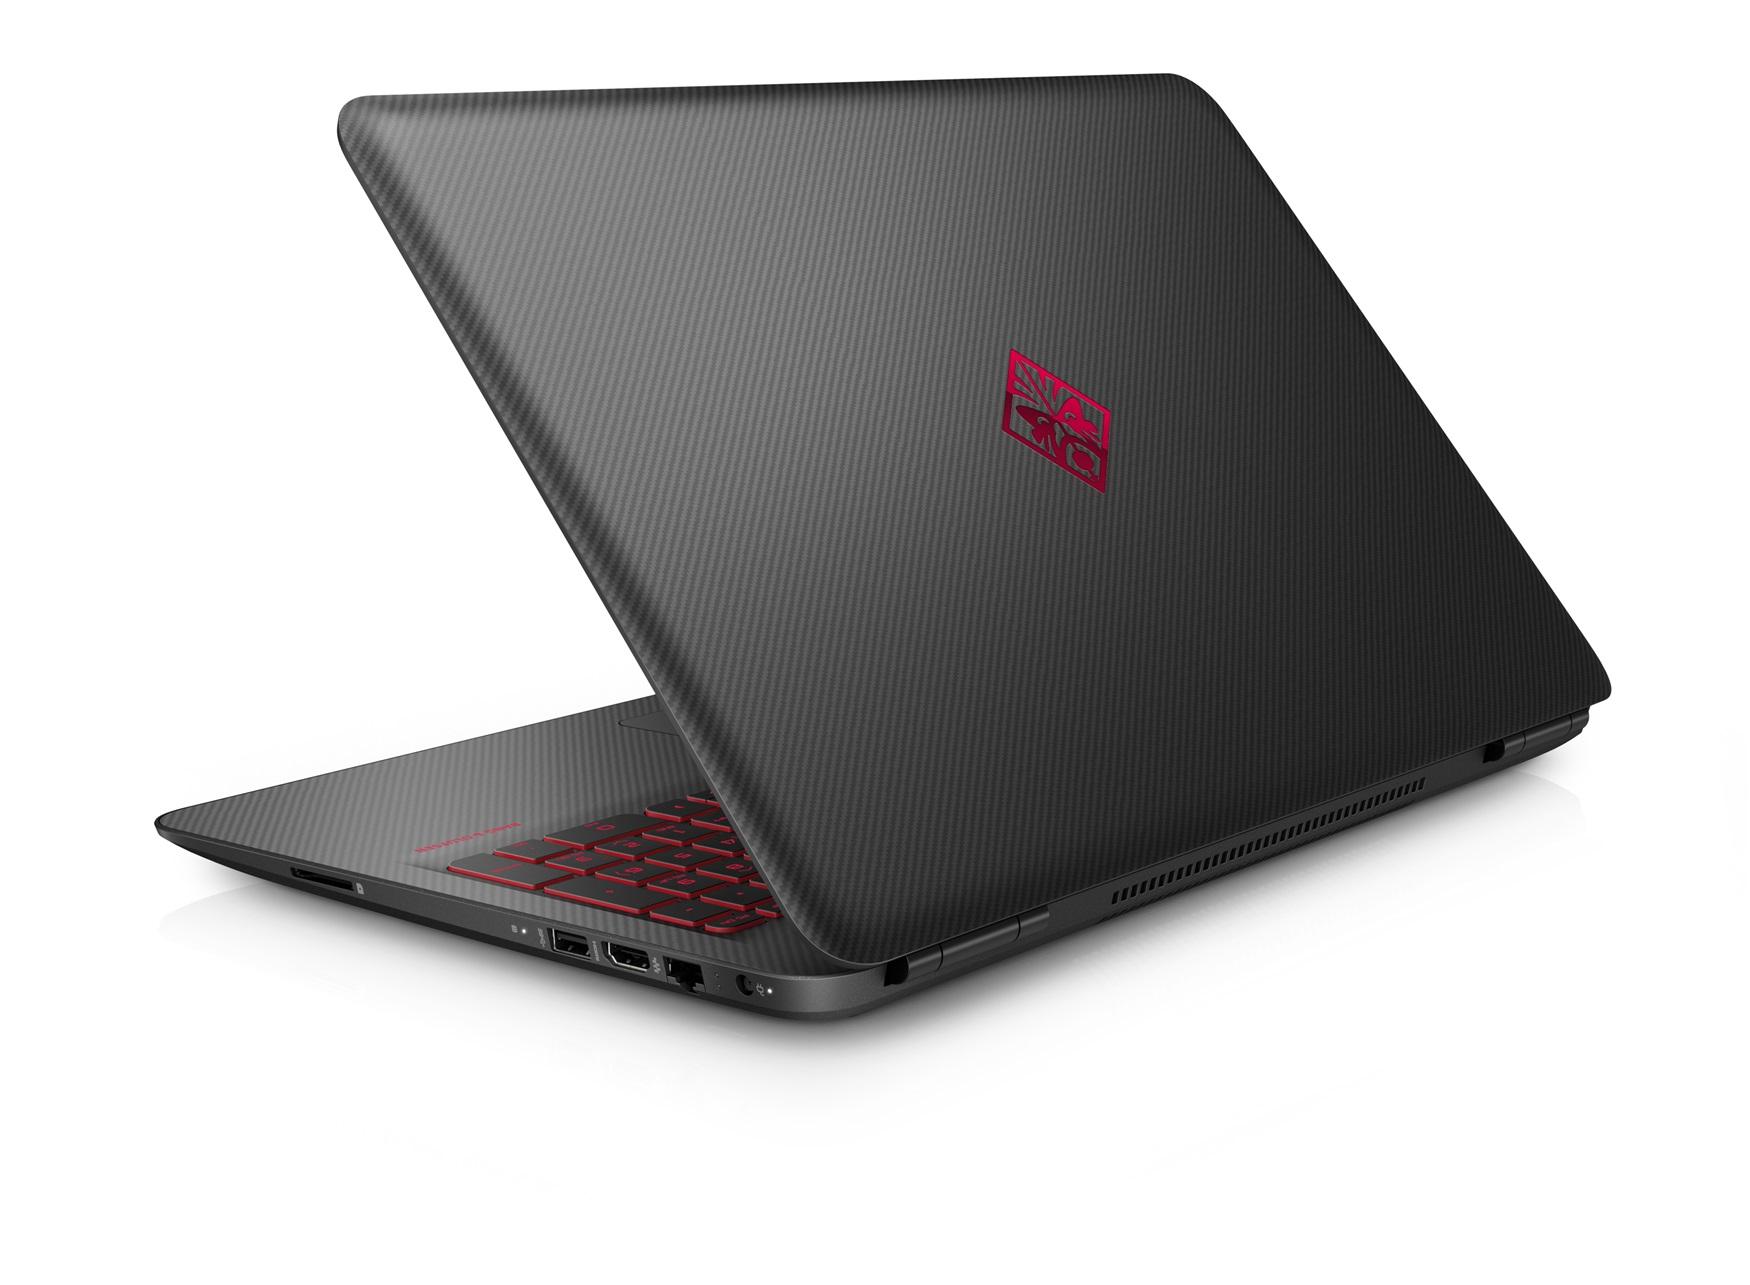 "HP OMEN 15-ax251nb 2.8GHz i7-7700HQ 15.6"" 3840 x 2160Pixel Nero, Carbonio, Rosso Computer portatile"